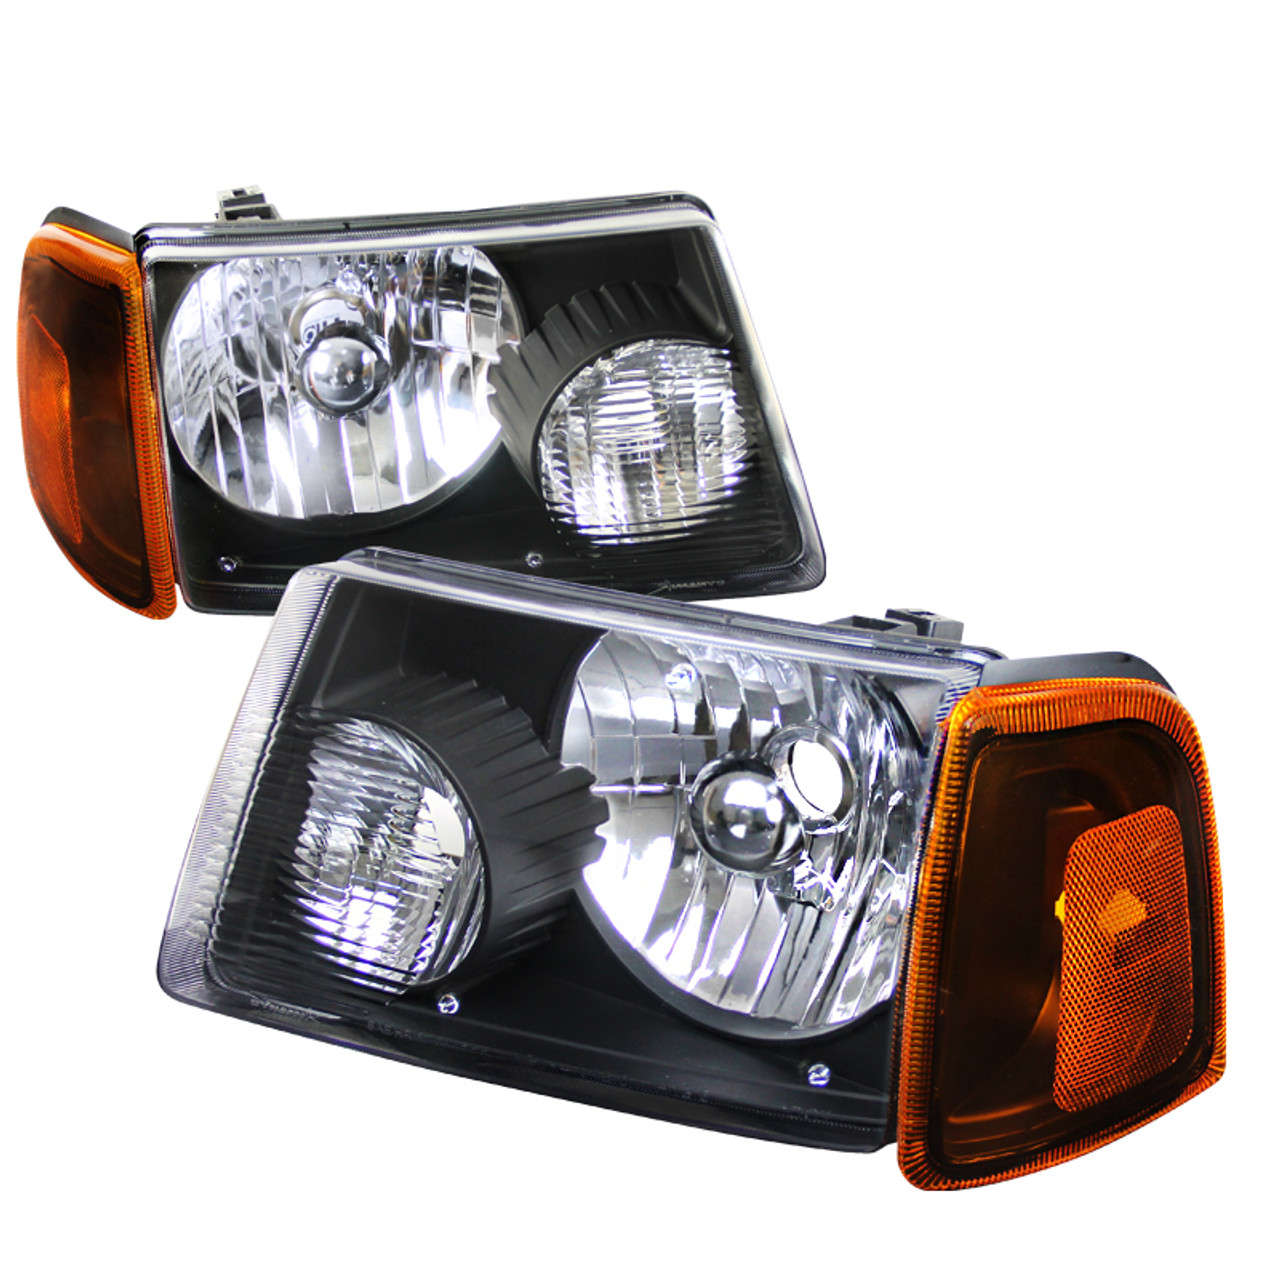 2001 2011 ford ranger clear lens headlights amber lens corner signal lights pair 4 pieces spec d tuning spec d tuning